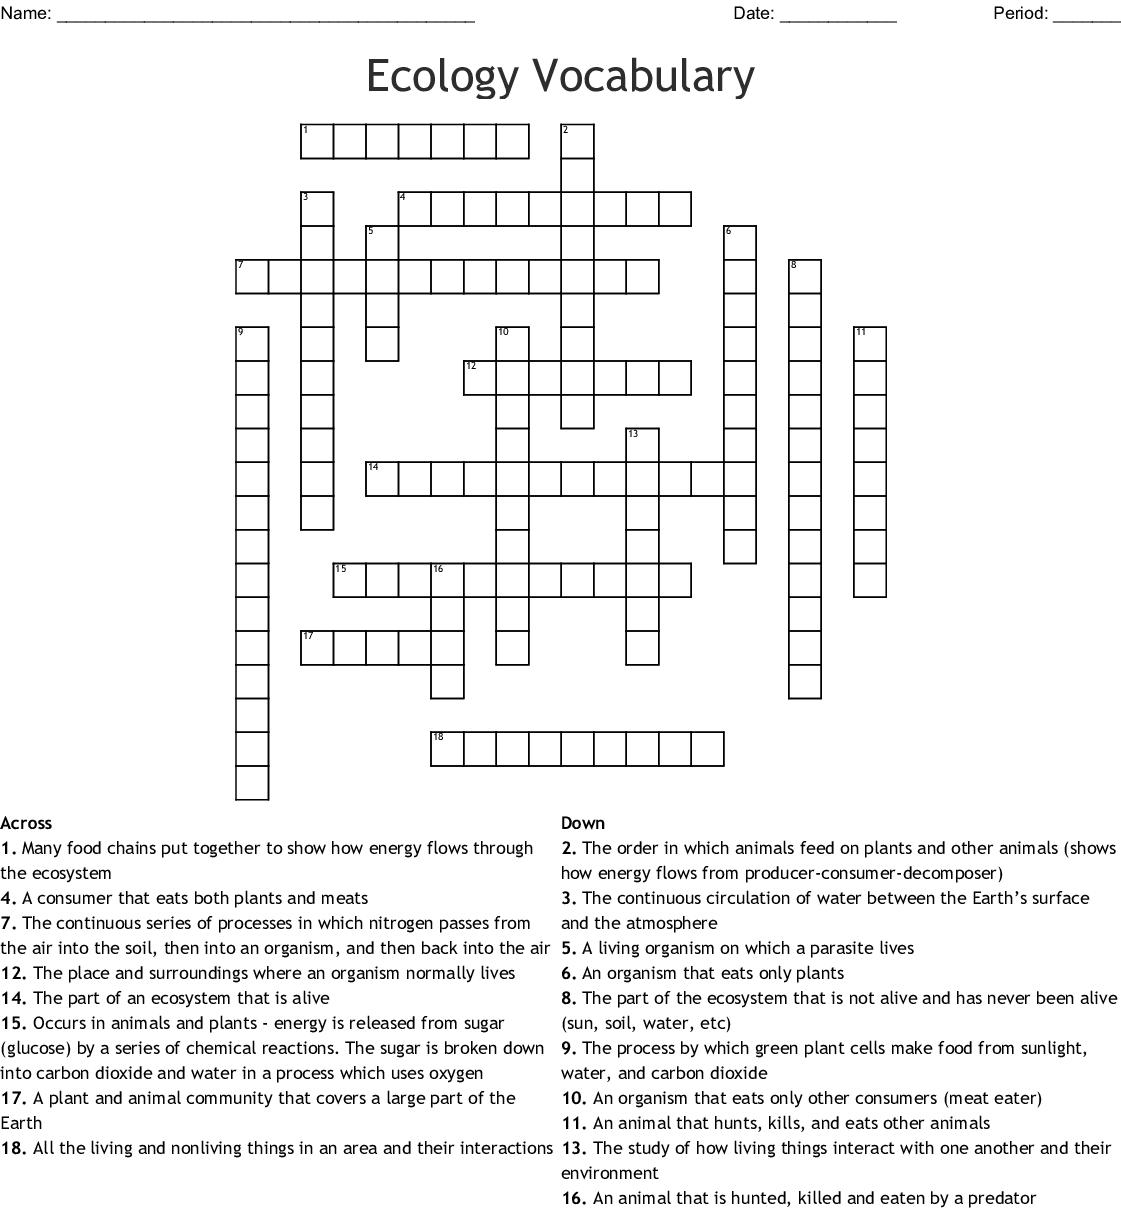 Ecology Vocabulary Crossword Puzzle Answer Key